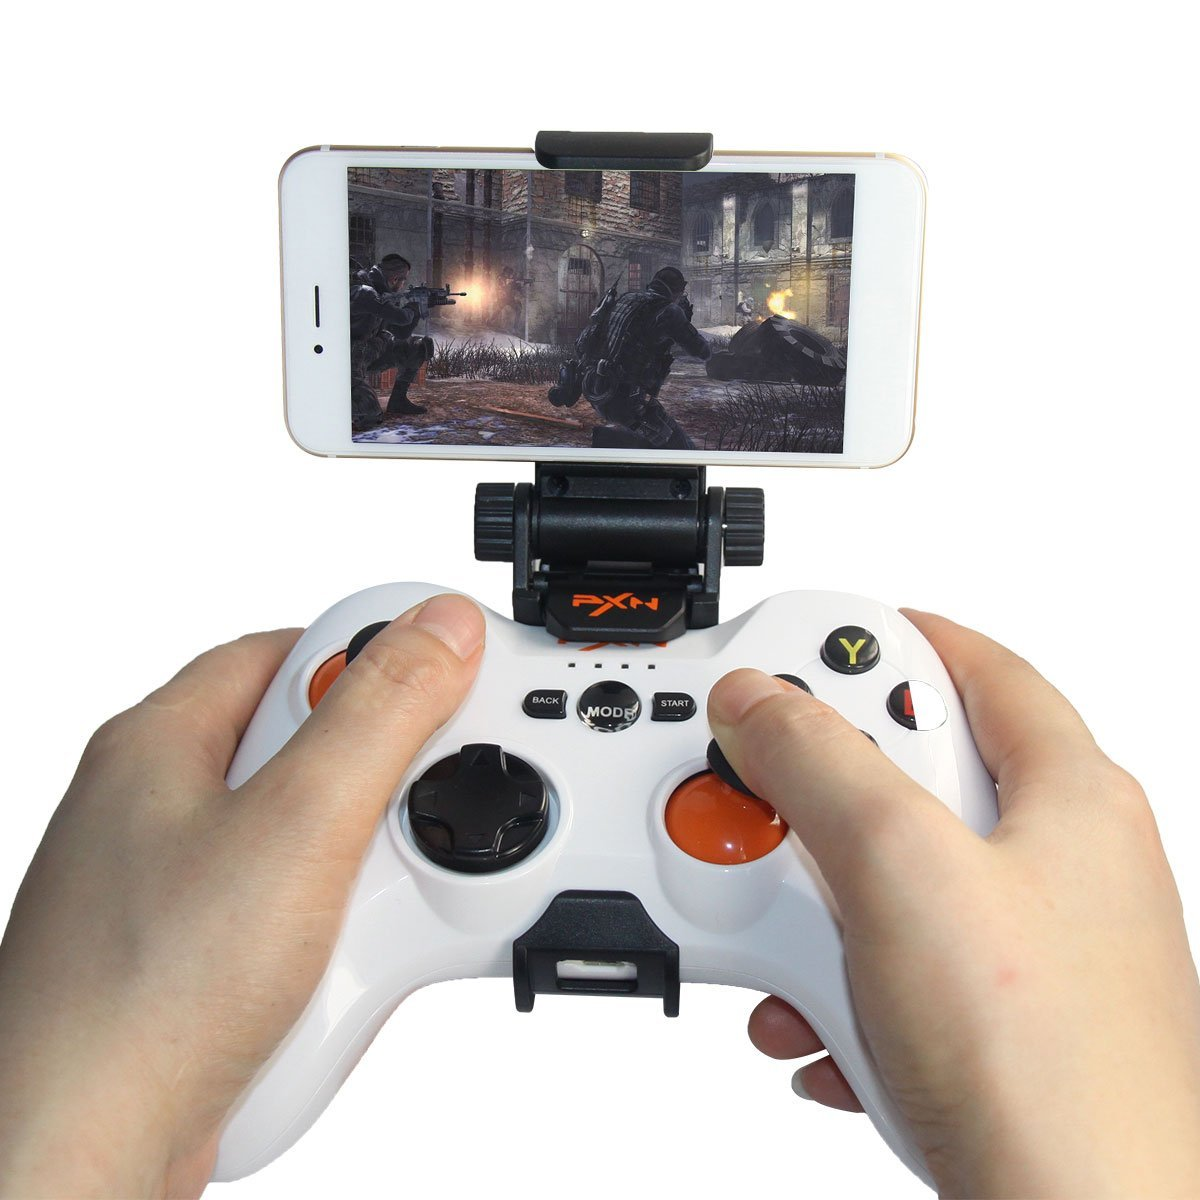 PXN-9613 2.4G Inalámbrico Gamepad Universal Controlador Mando Juego para Samsung Android TV Box Tablet PC 360(Blanco): Amazon.es: Electrónica